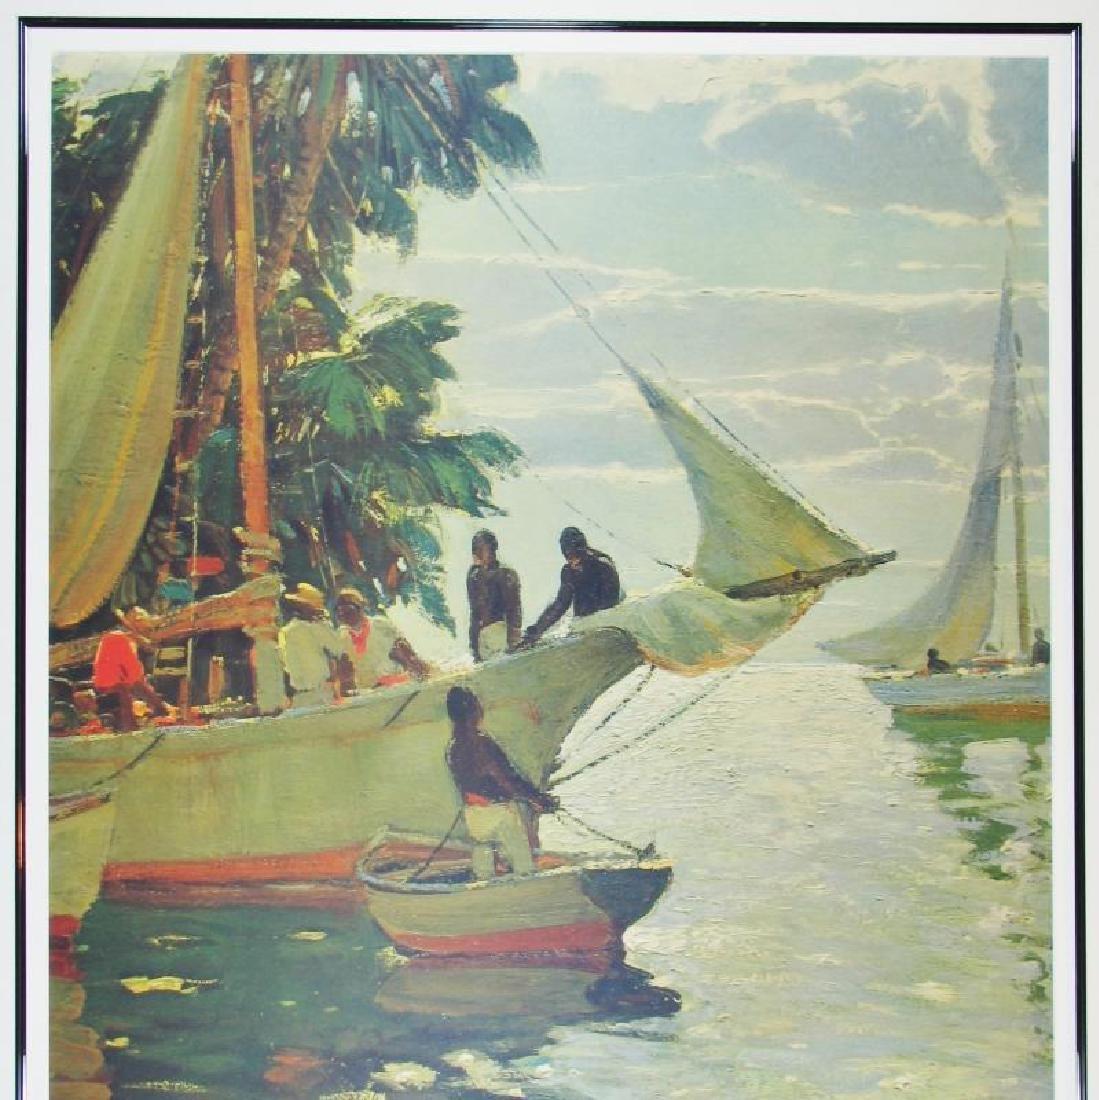 Island Art Print Low Price Great Art Sale - 2